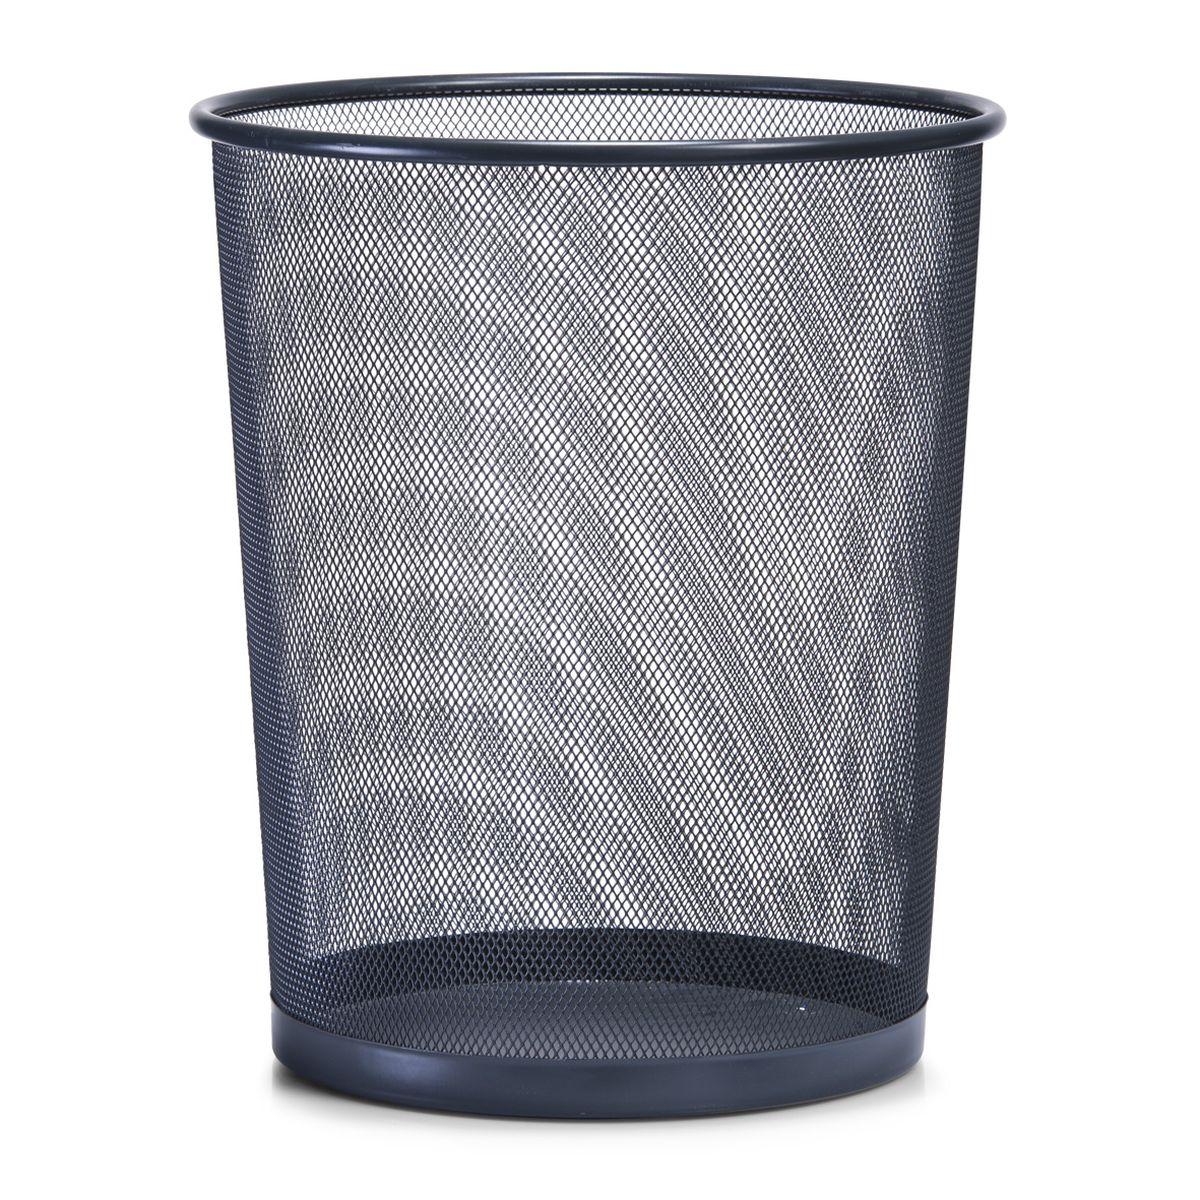 Корзина для мусора Zeller, 29,5 х 35 см корзина для мусора qualy cherry